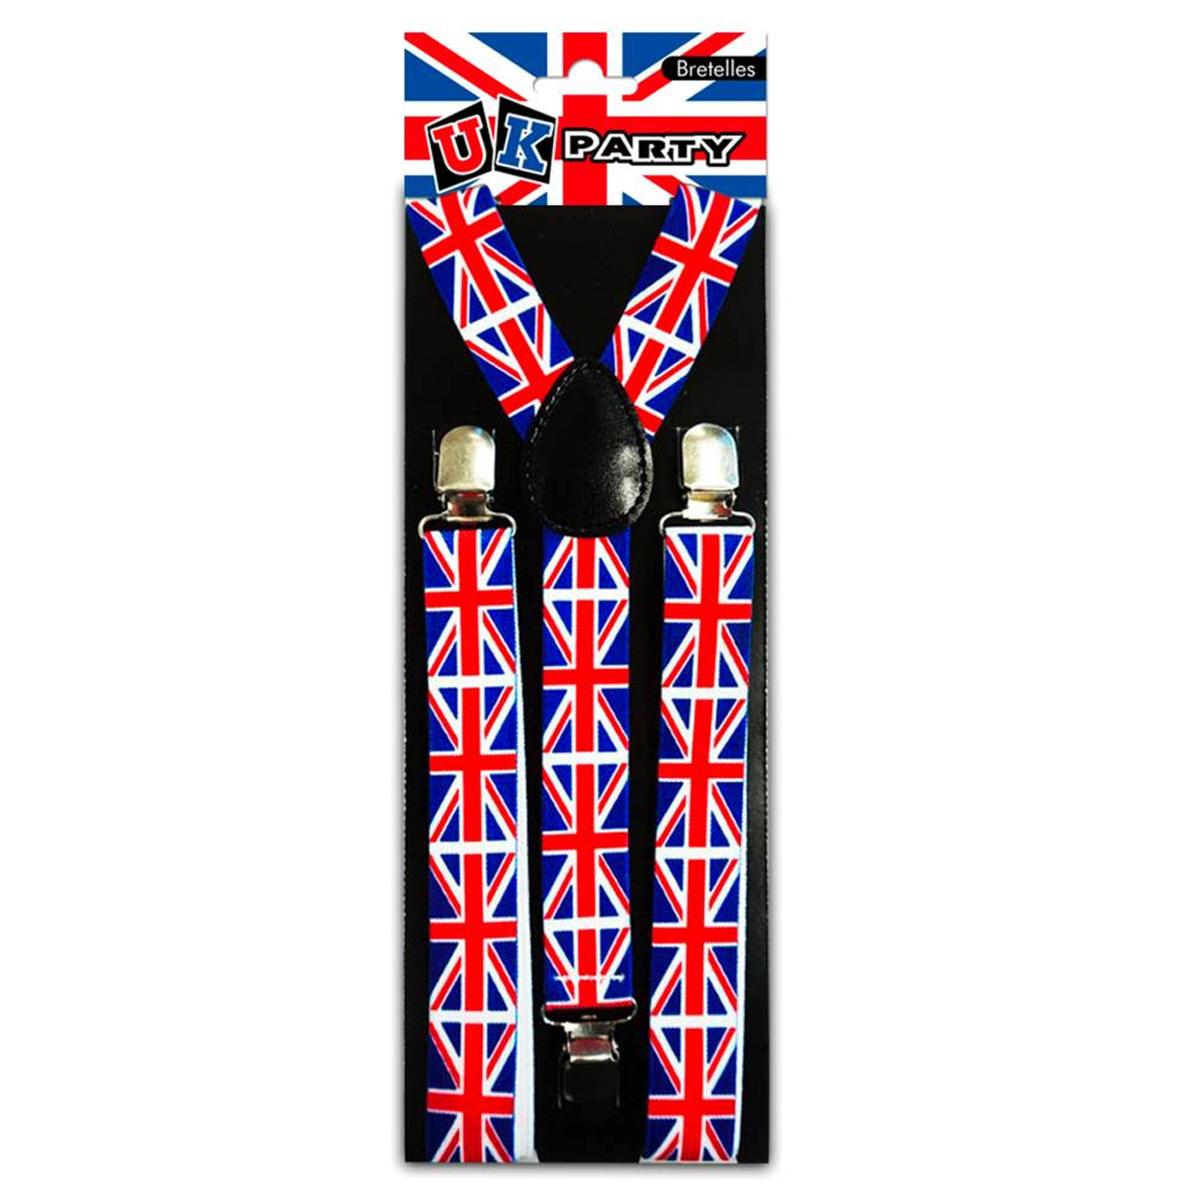 Bretelles \'So British\' bleu blanc rouge (Union Jack) - [M9094]